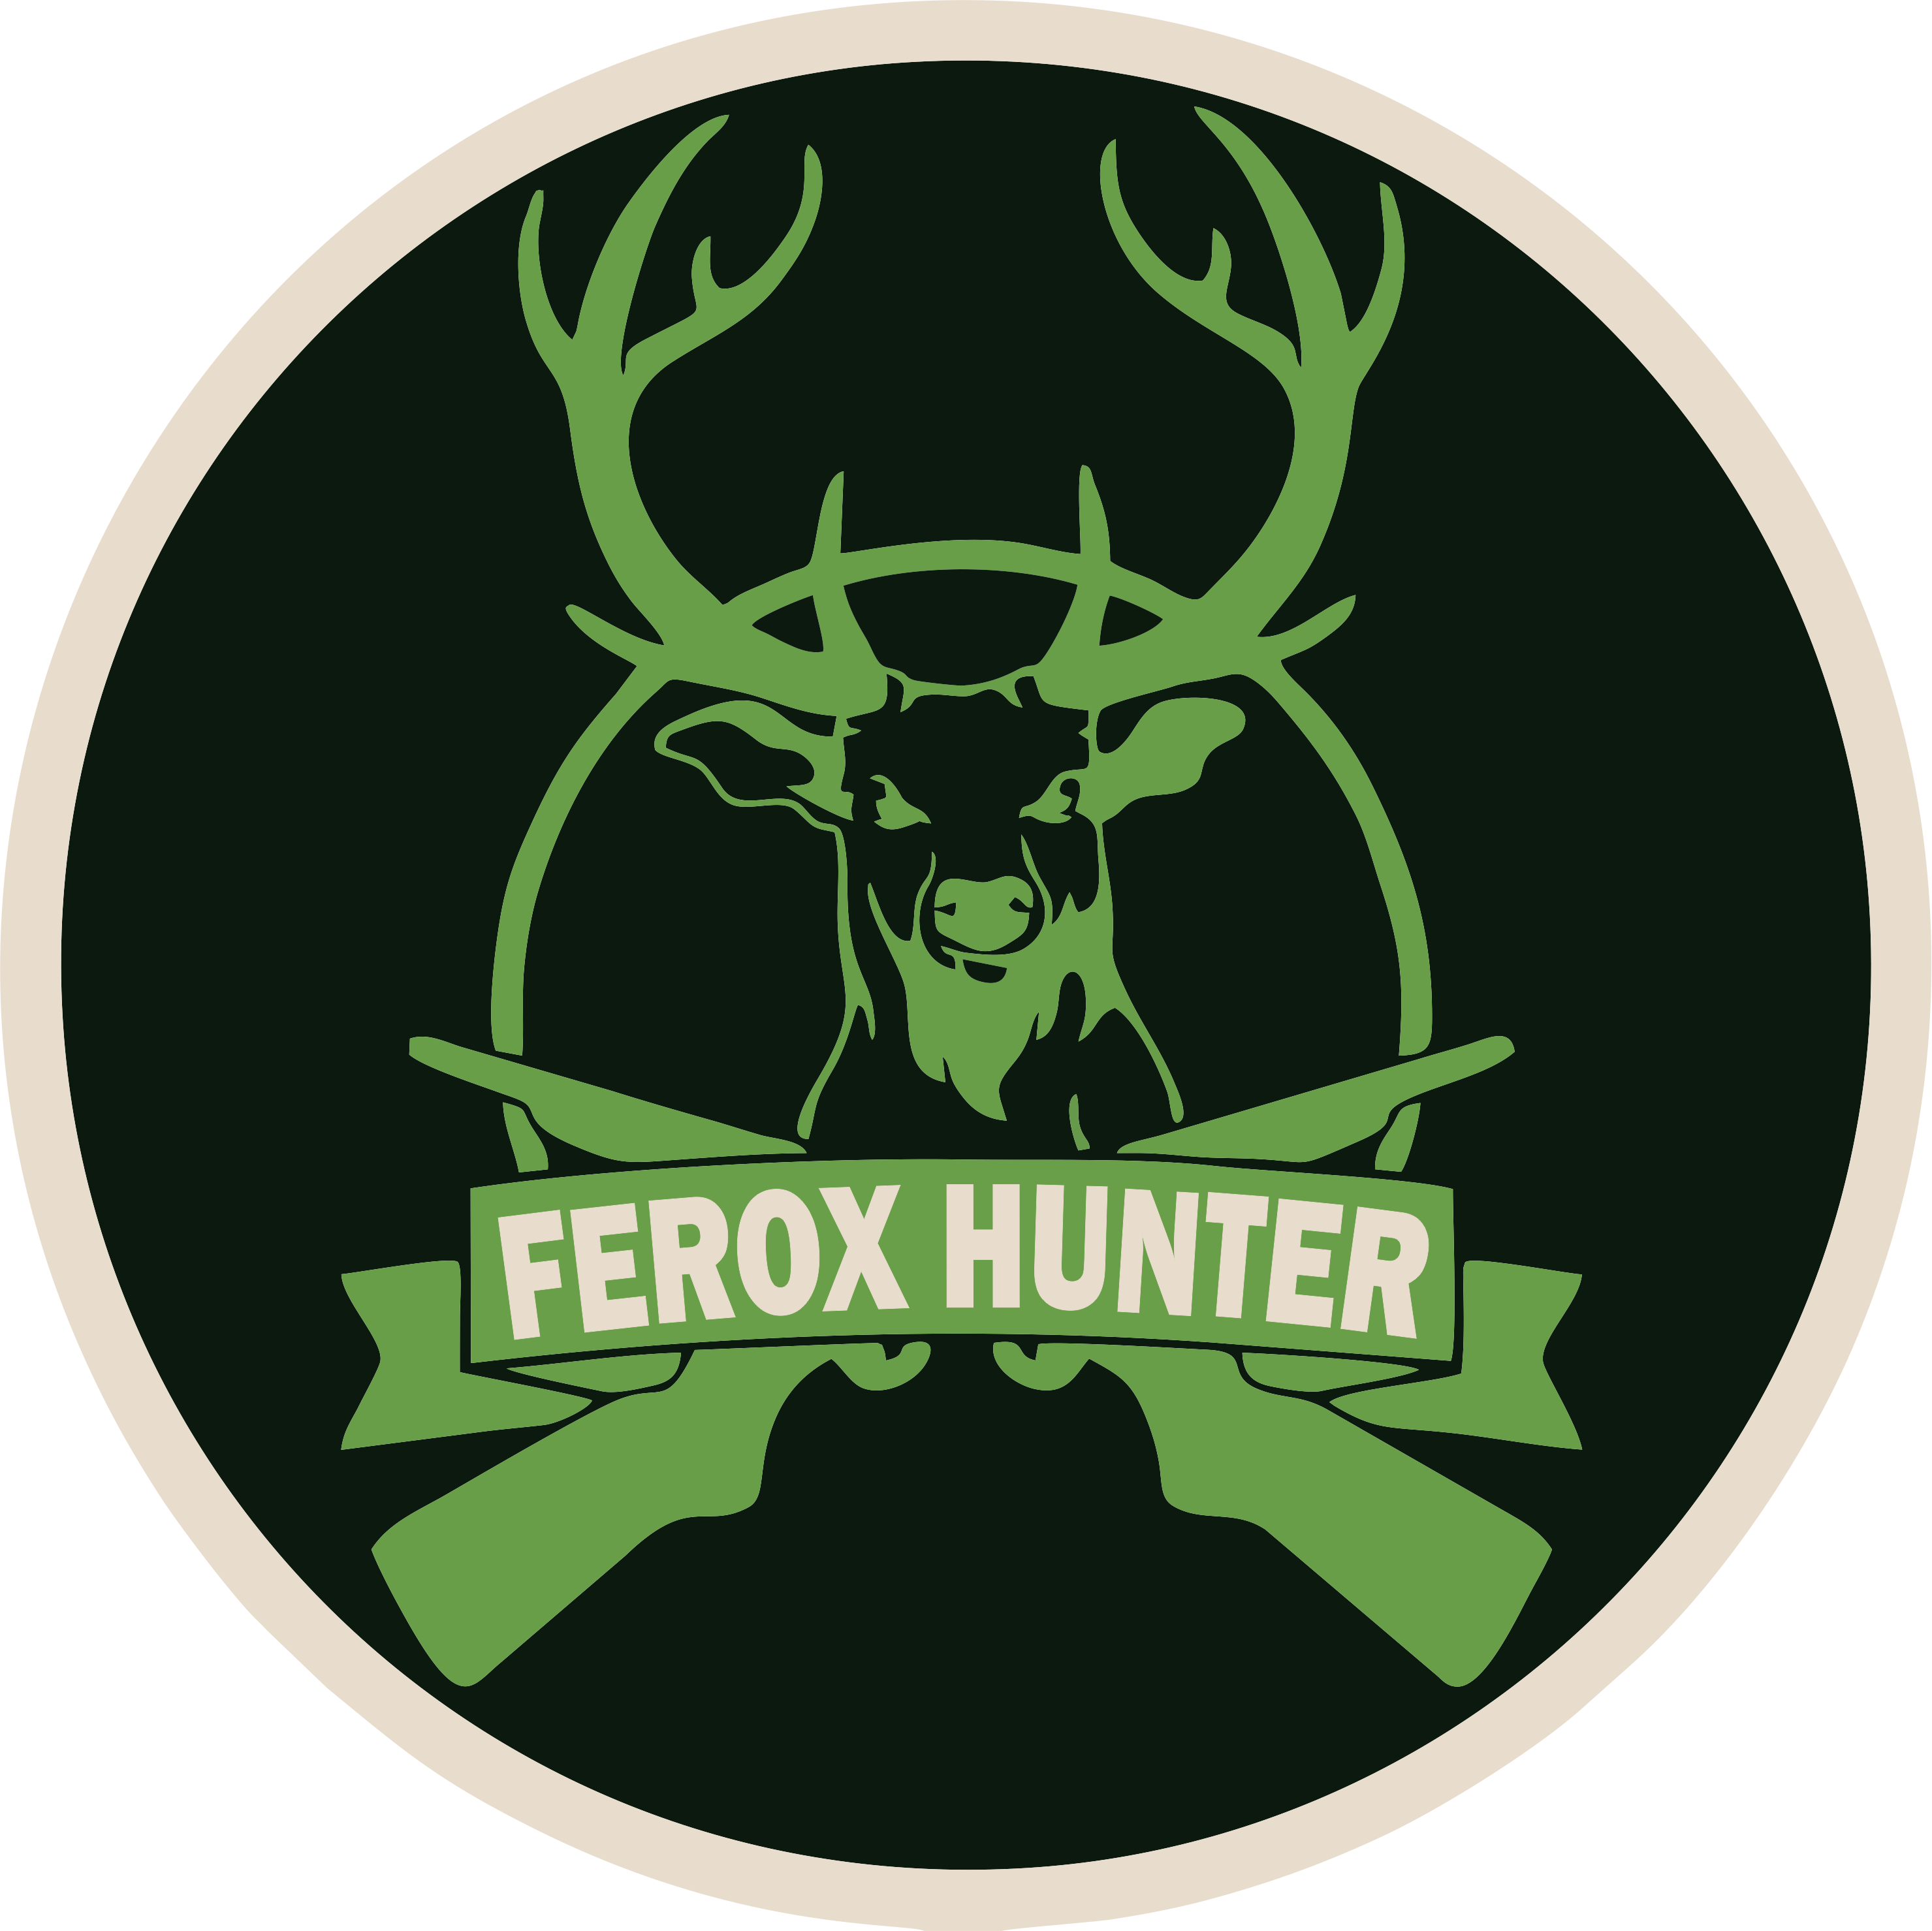 Ferox hunter doo